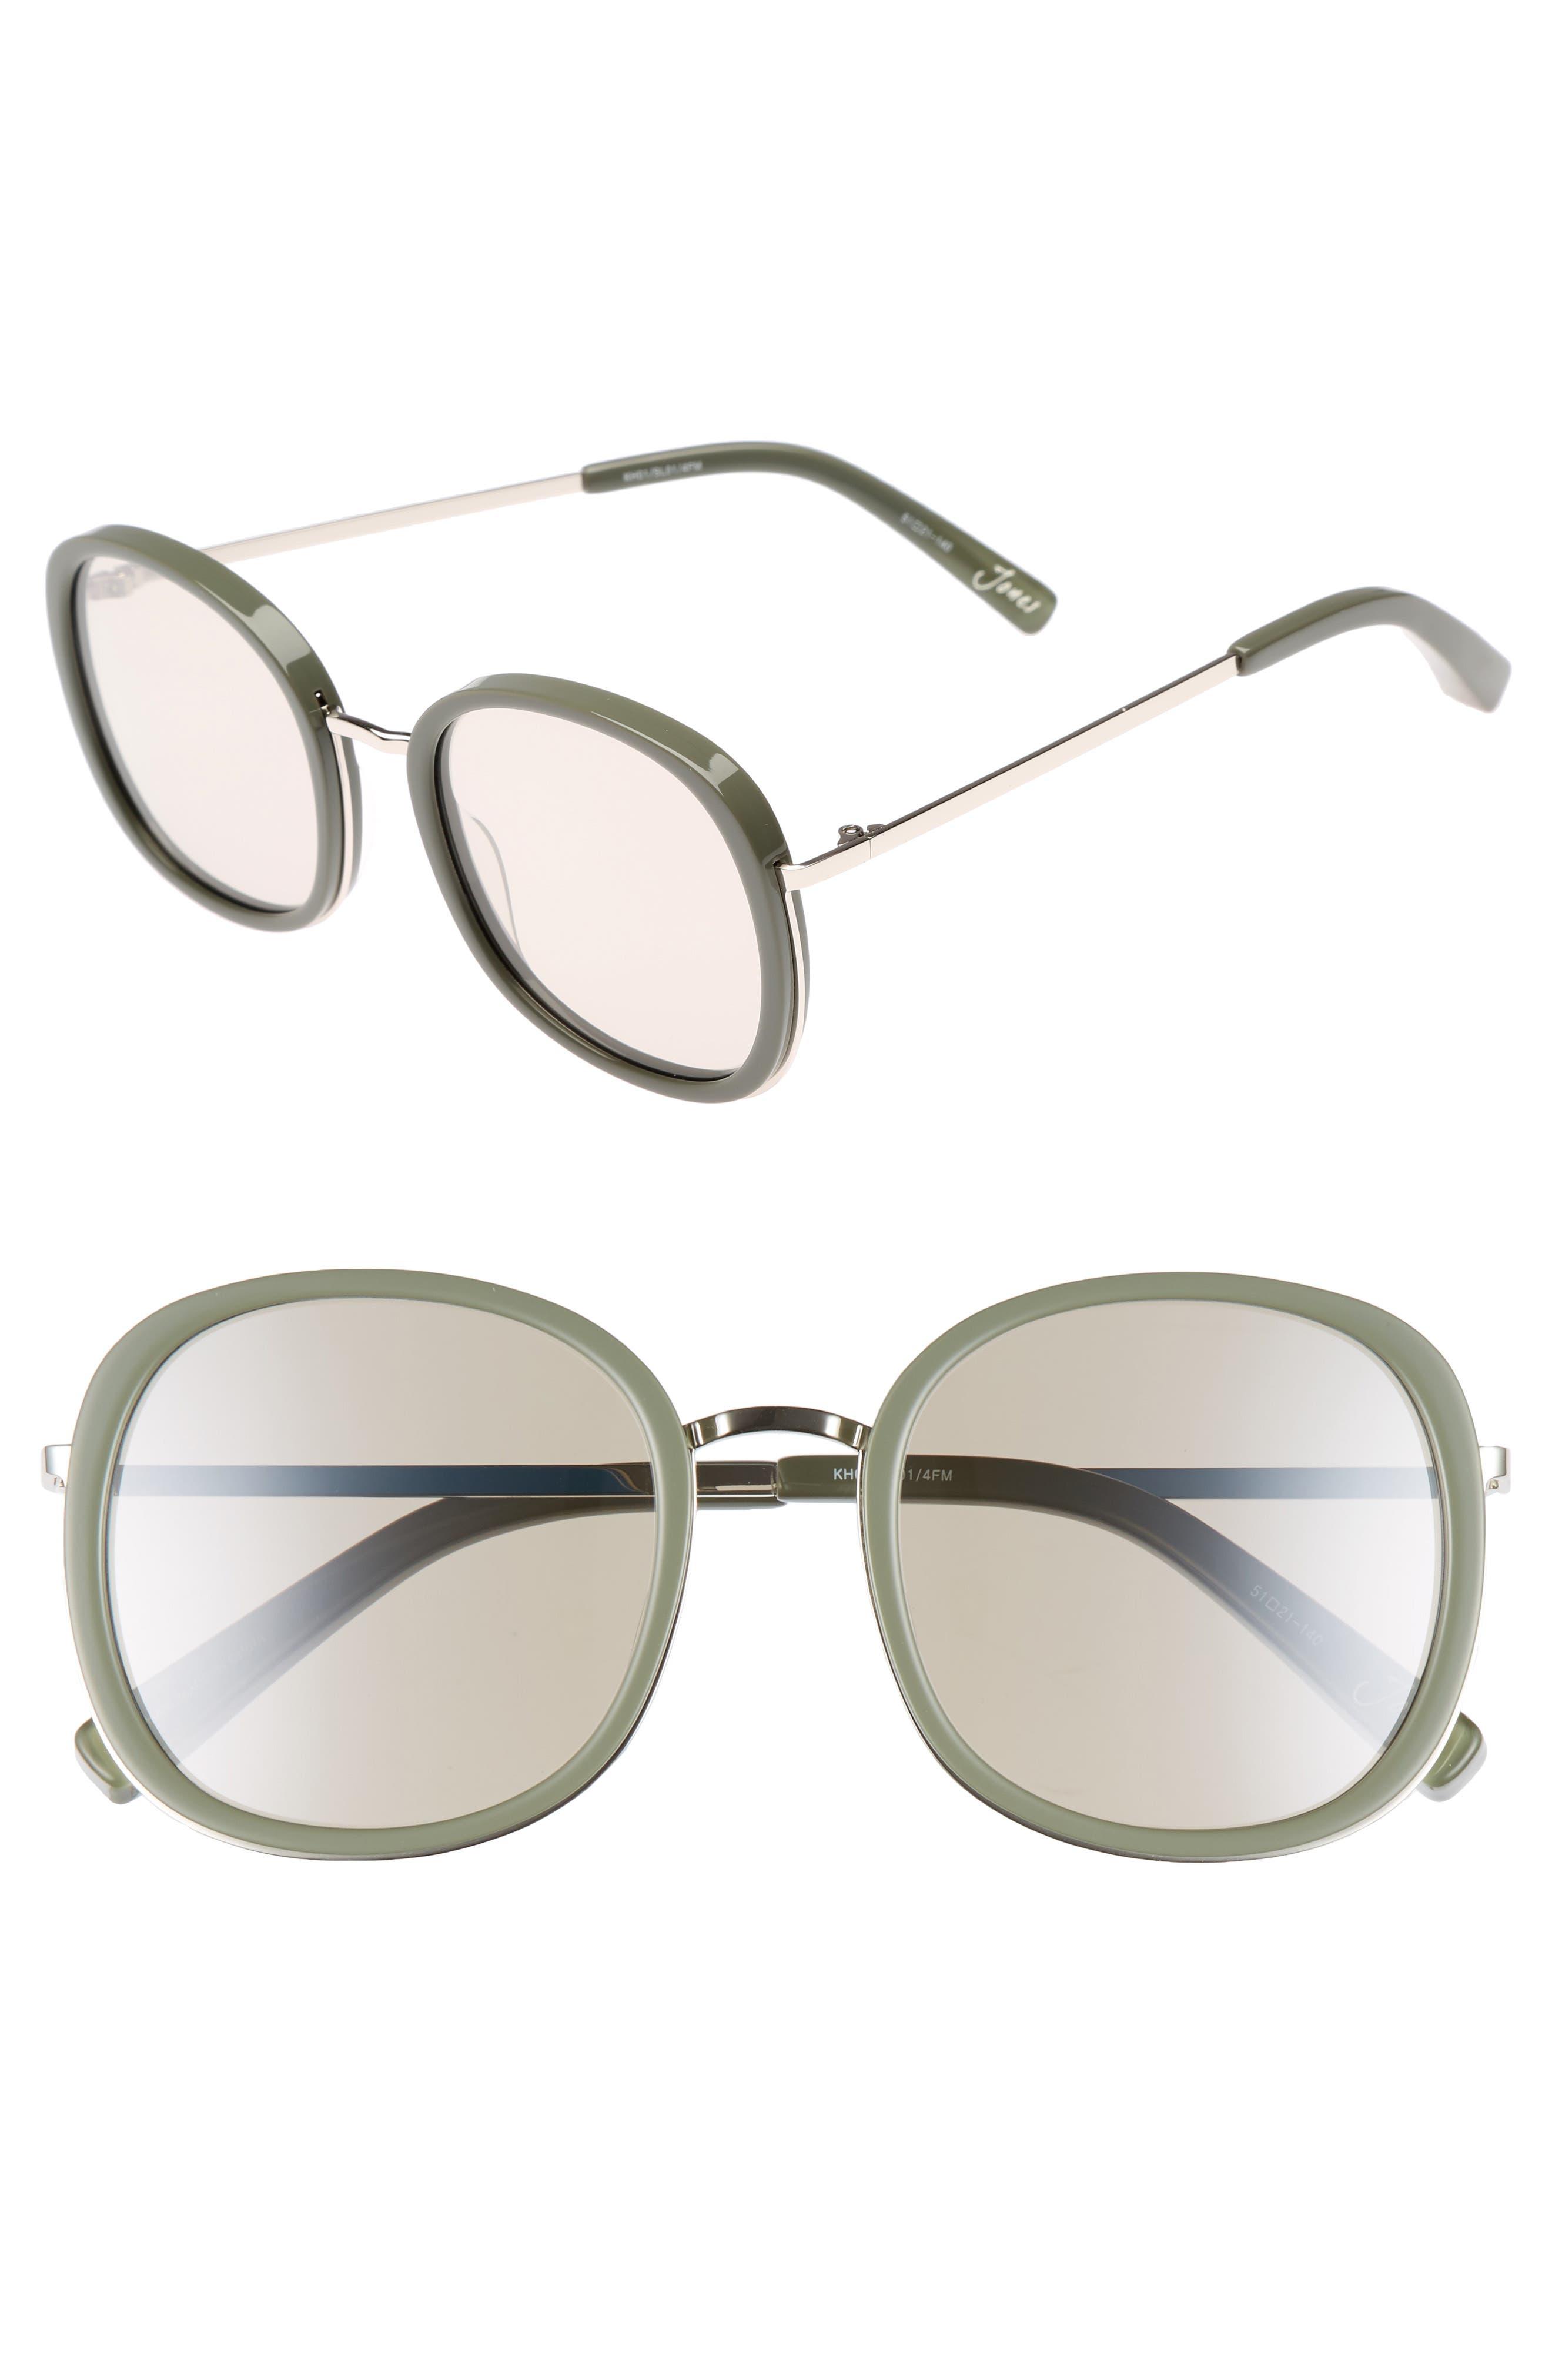 1960s Sunglasses   70s Sunglasses, 70s Glasses Womens Elizabeth And James Jones 51Mm Round Sunglasses - $185.00 AT vintagedancer.com